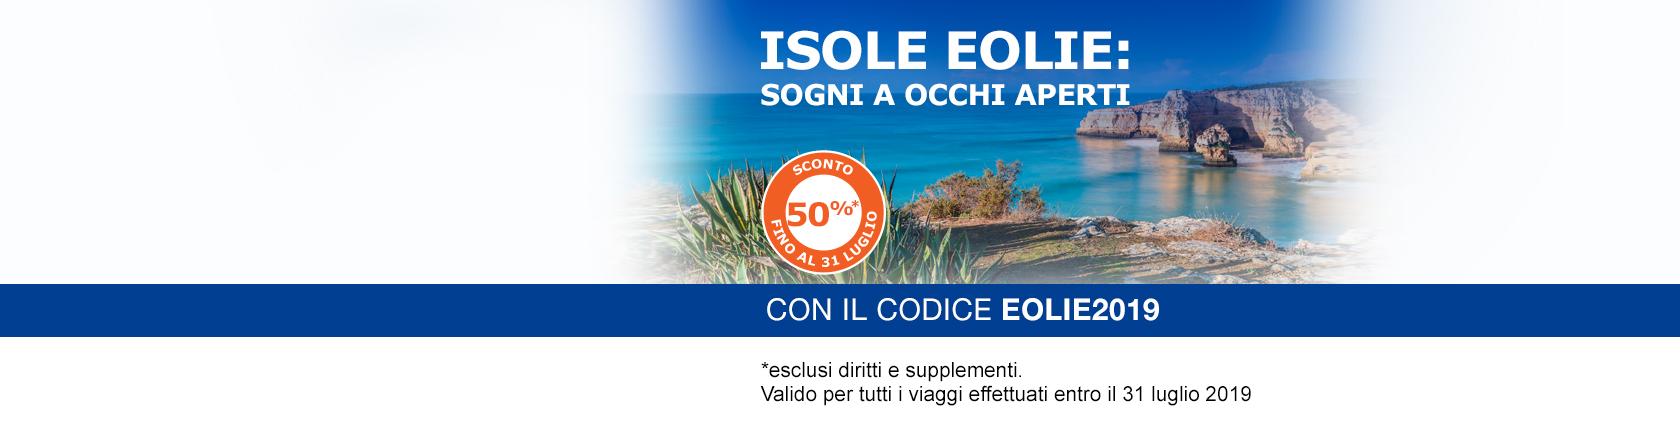 Promo Isole Eolie